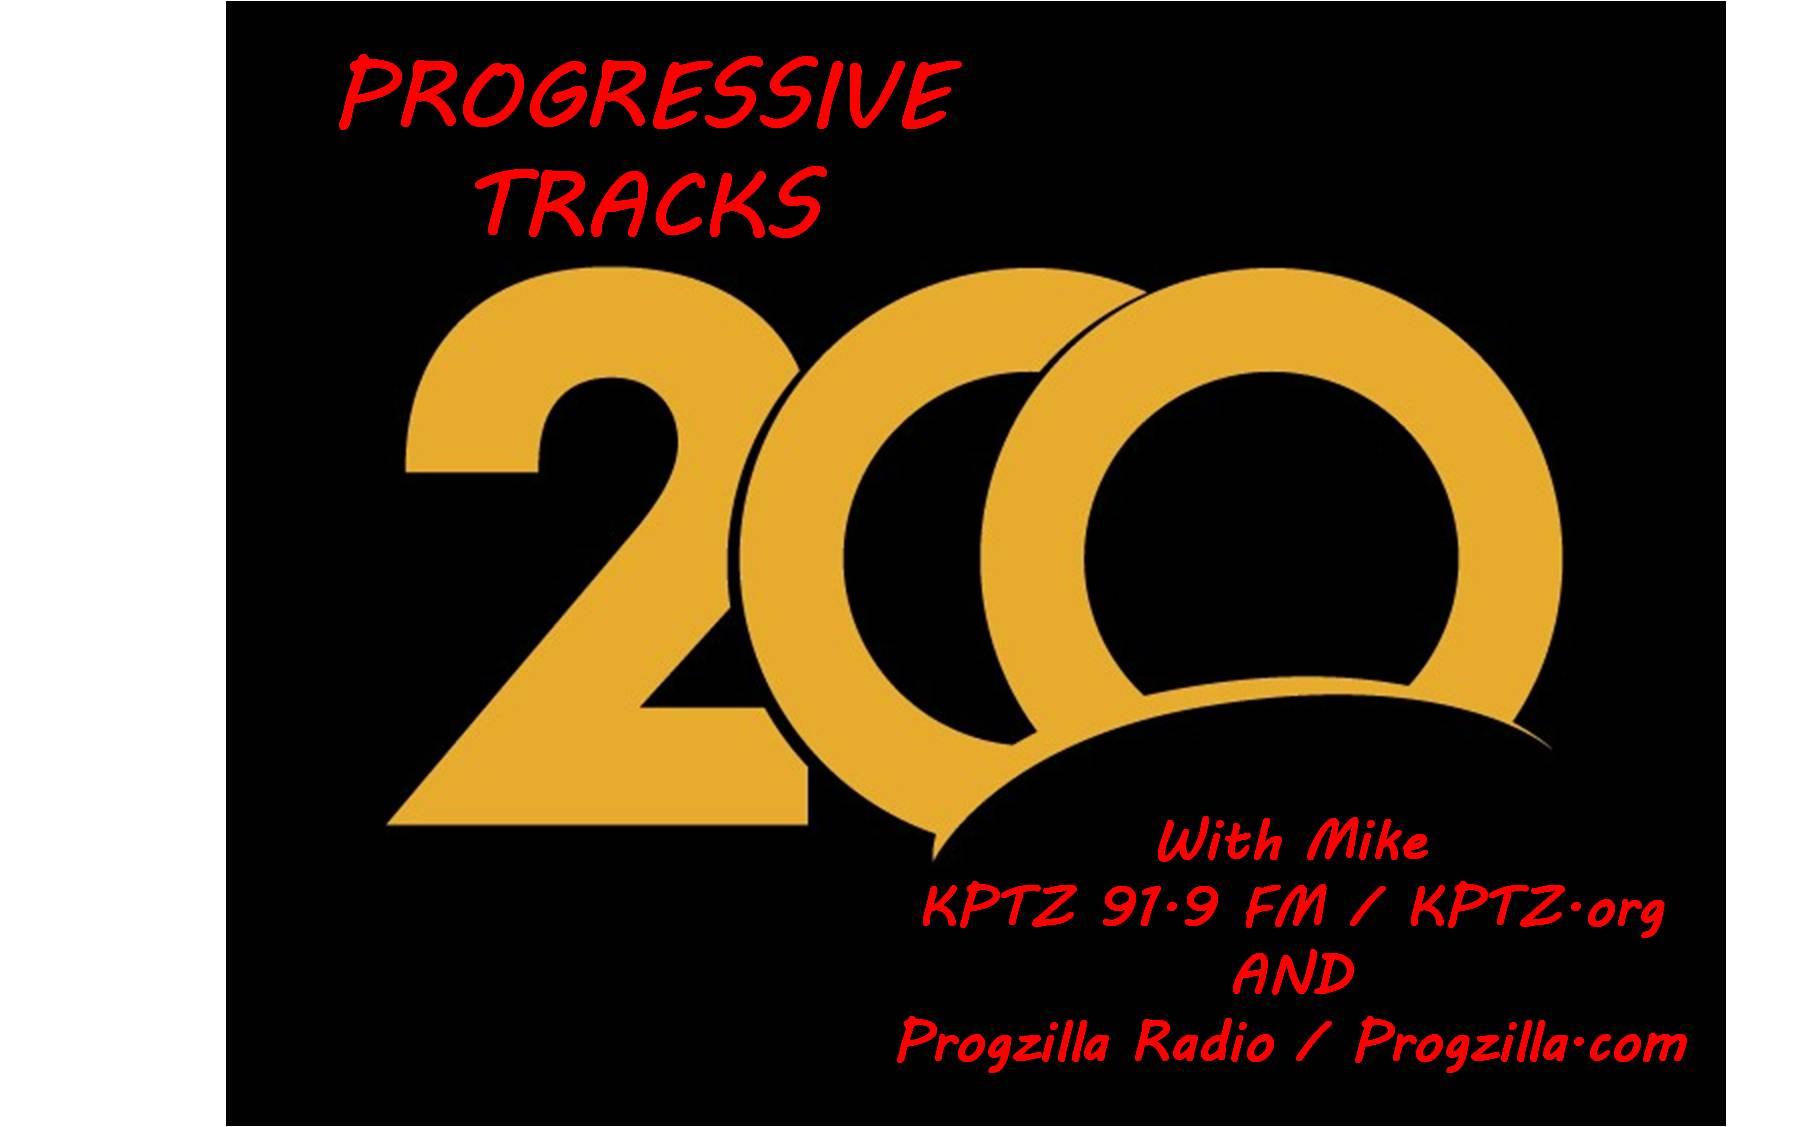 Progressive Tracks #200